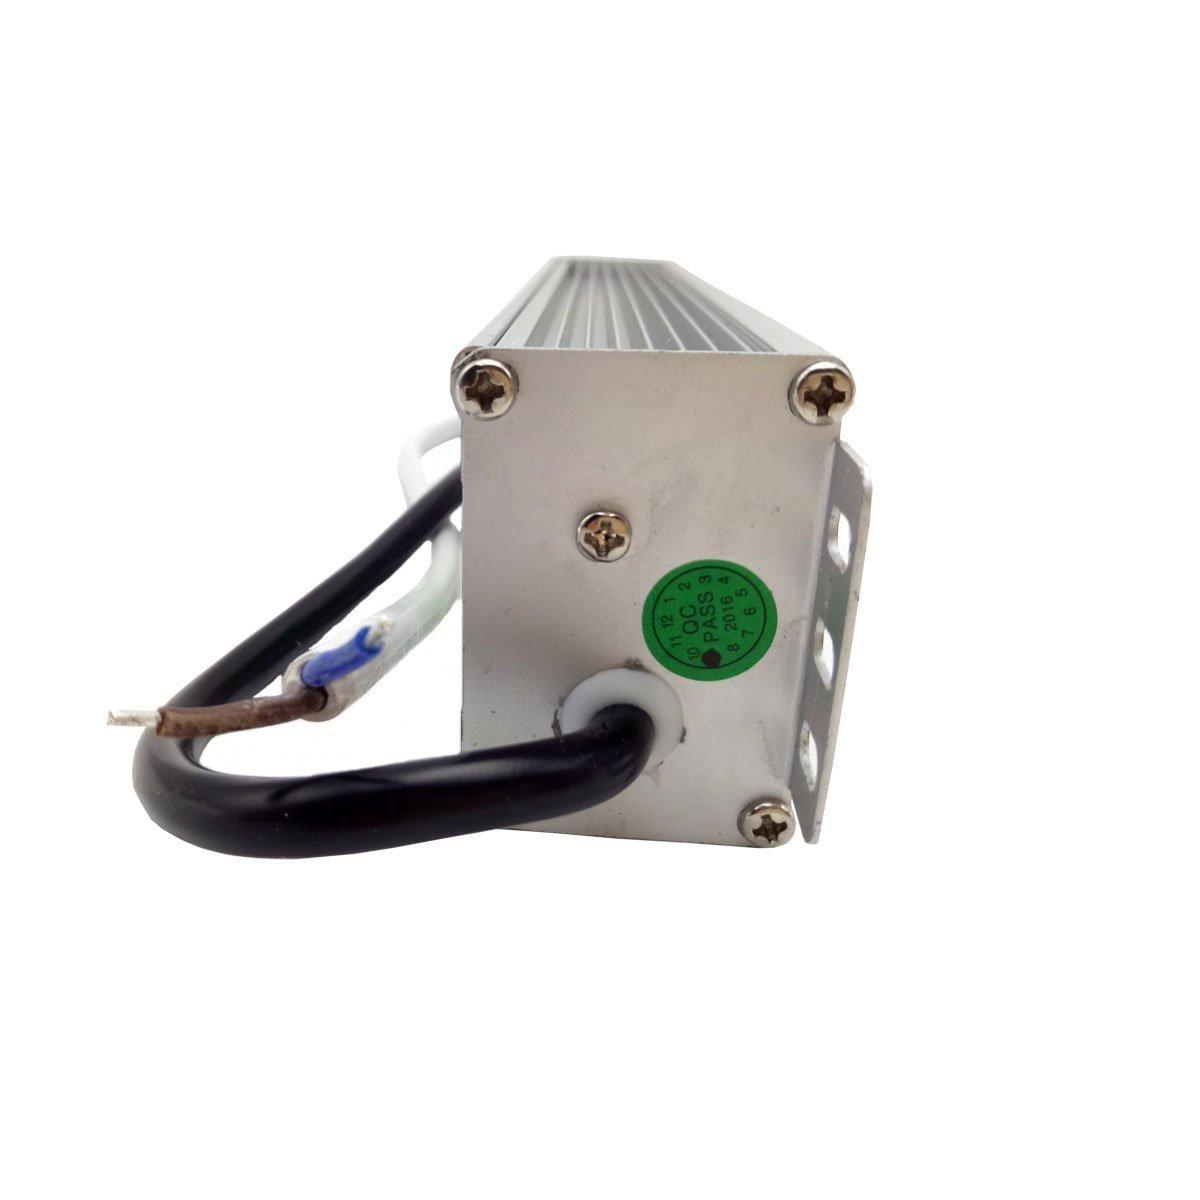 DC Out 12V 6.67Amp Lighting Transformer 80.0 Watts//IP67 LEDSoneTransformer 80Watts/_ LED Strip Module Driver/_ DC12V Power Supply/_ Outdoor Lighting IP67 Waterproof Ac in 90-265V